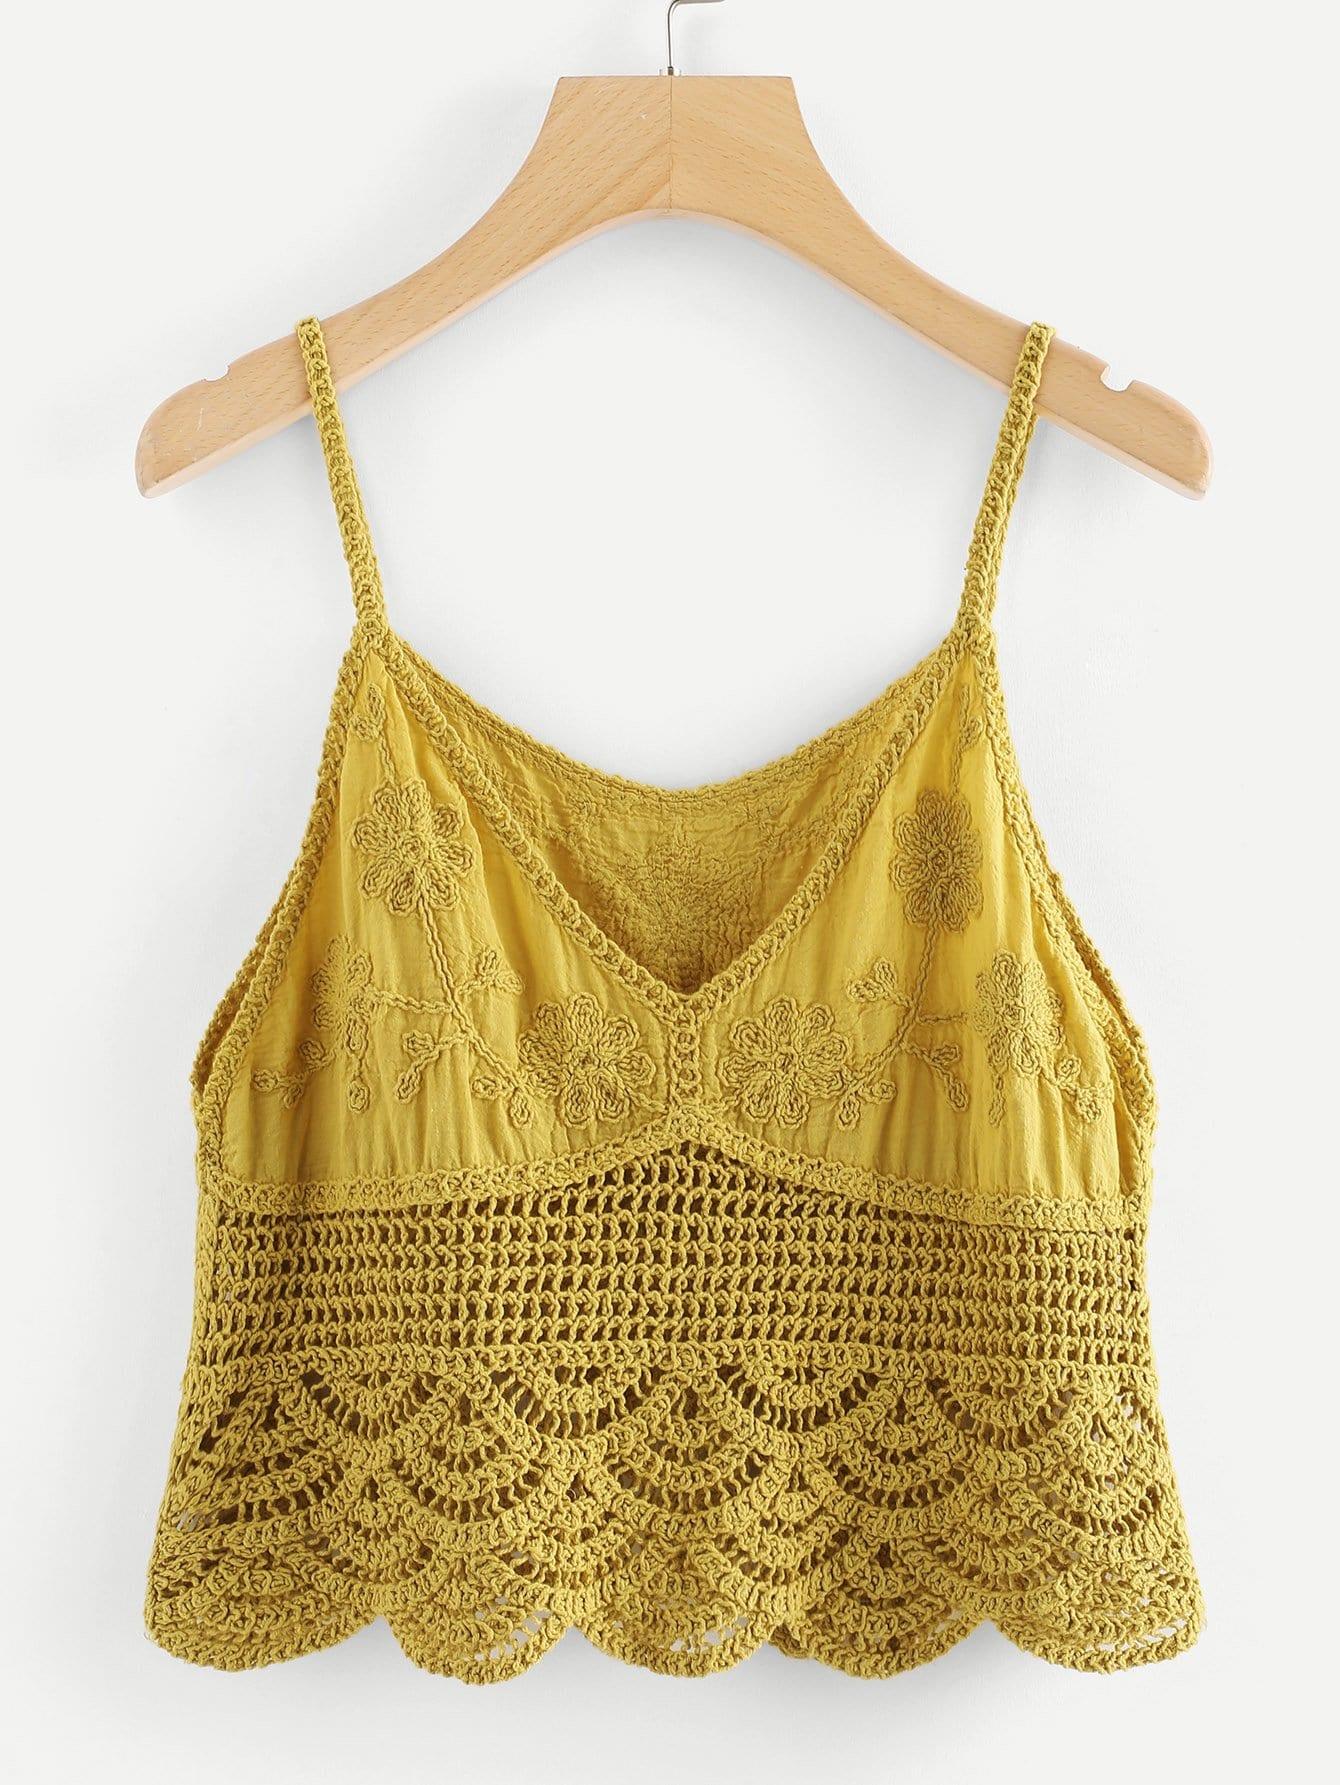 Scallop Hem Hollow Crochet Cami Top crochet lace hollow out cami top